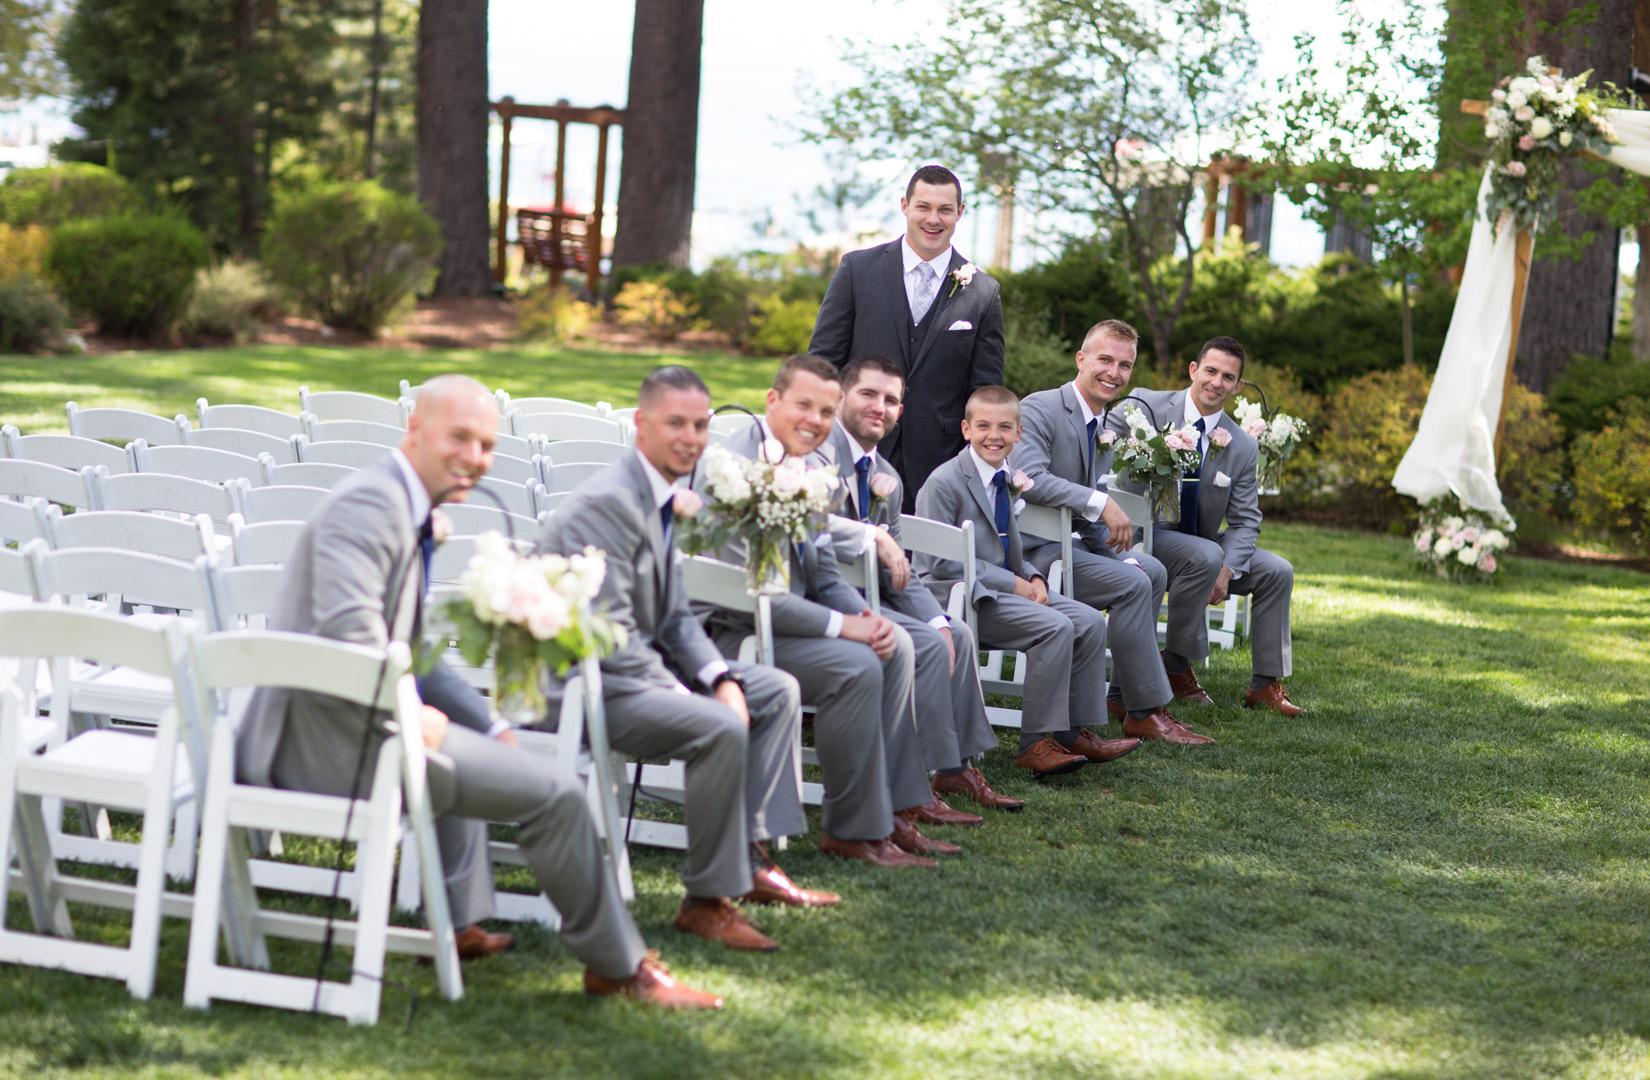 Hyatt-groom-and-friends